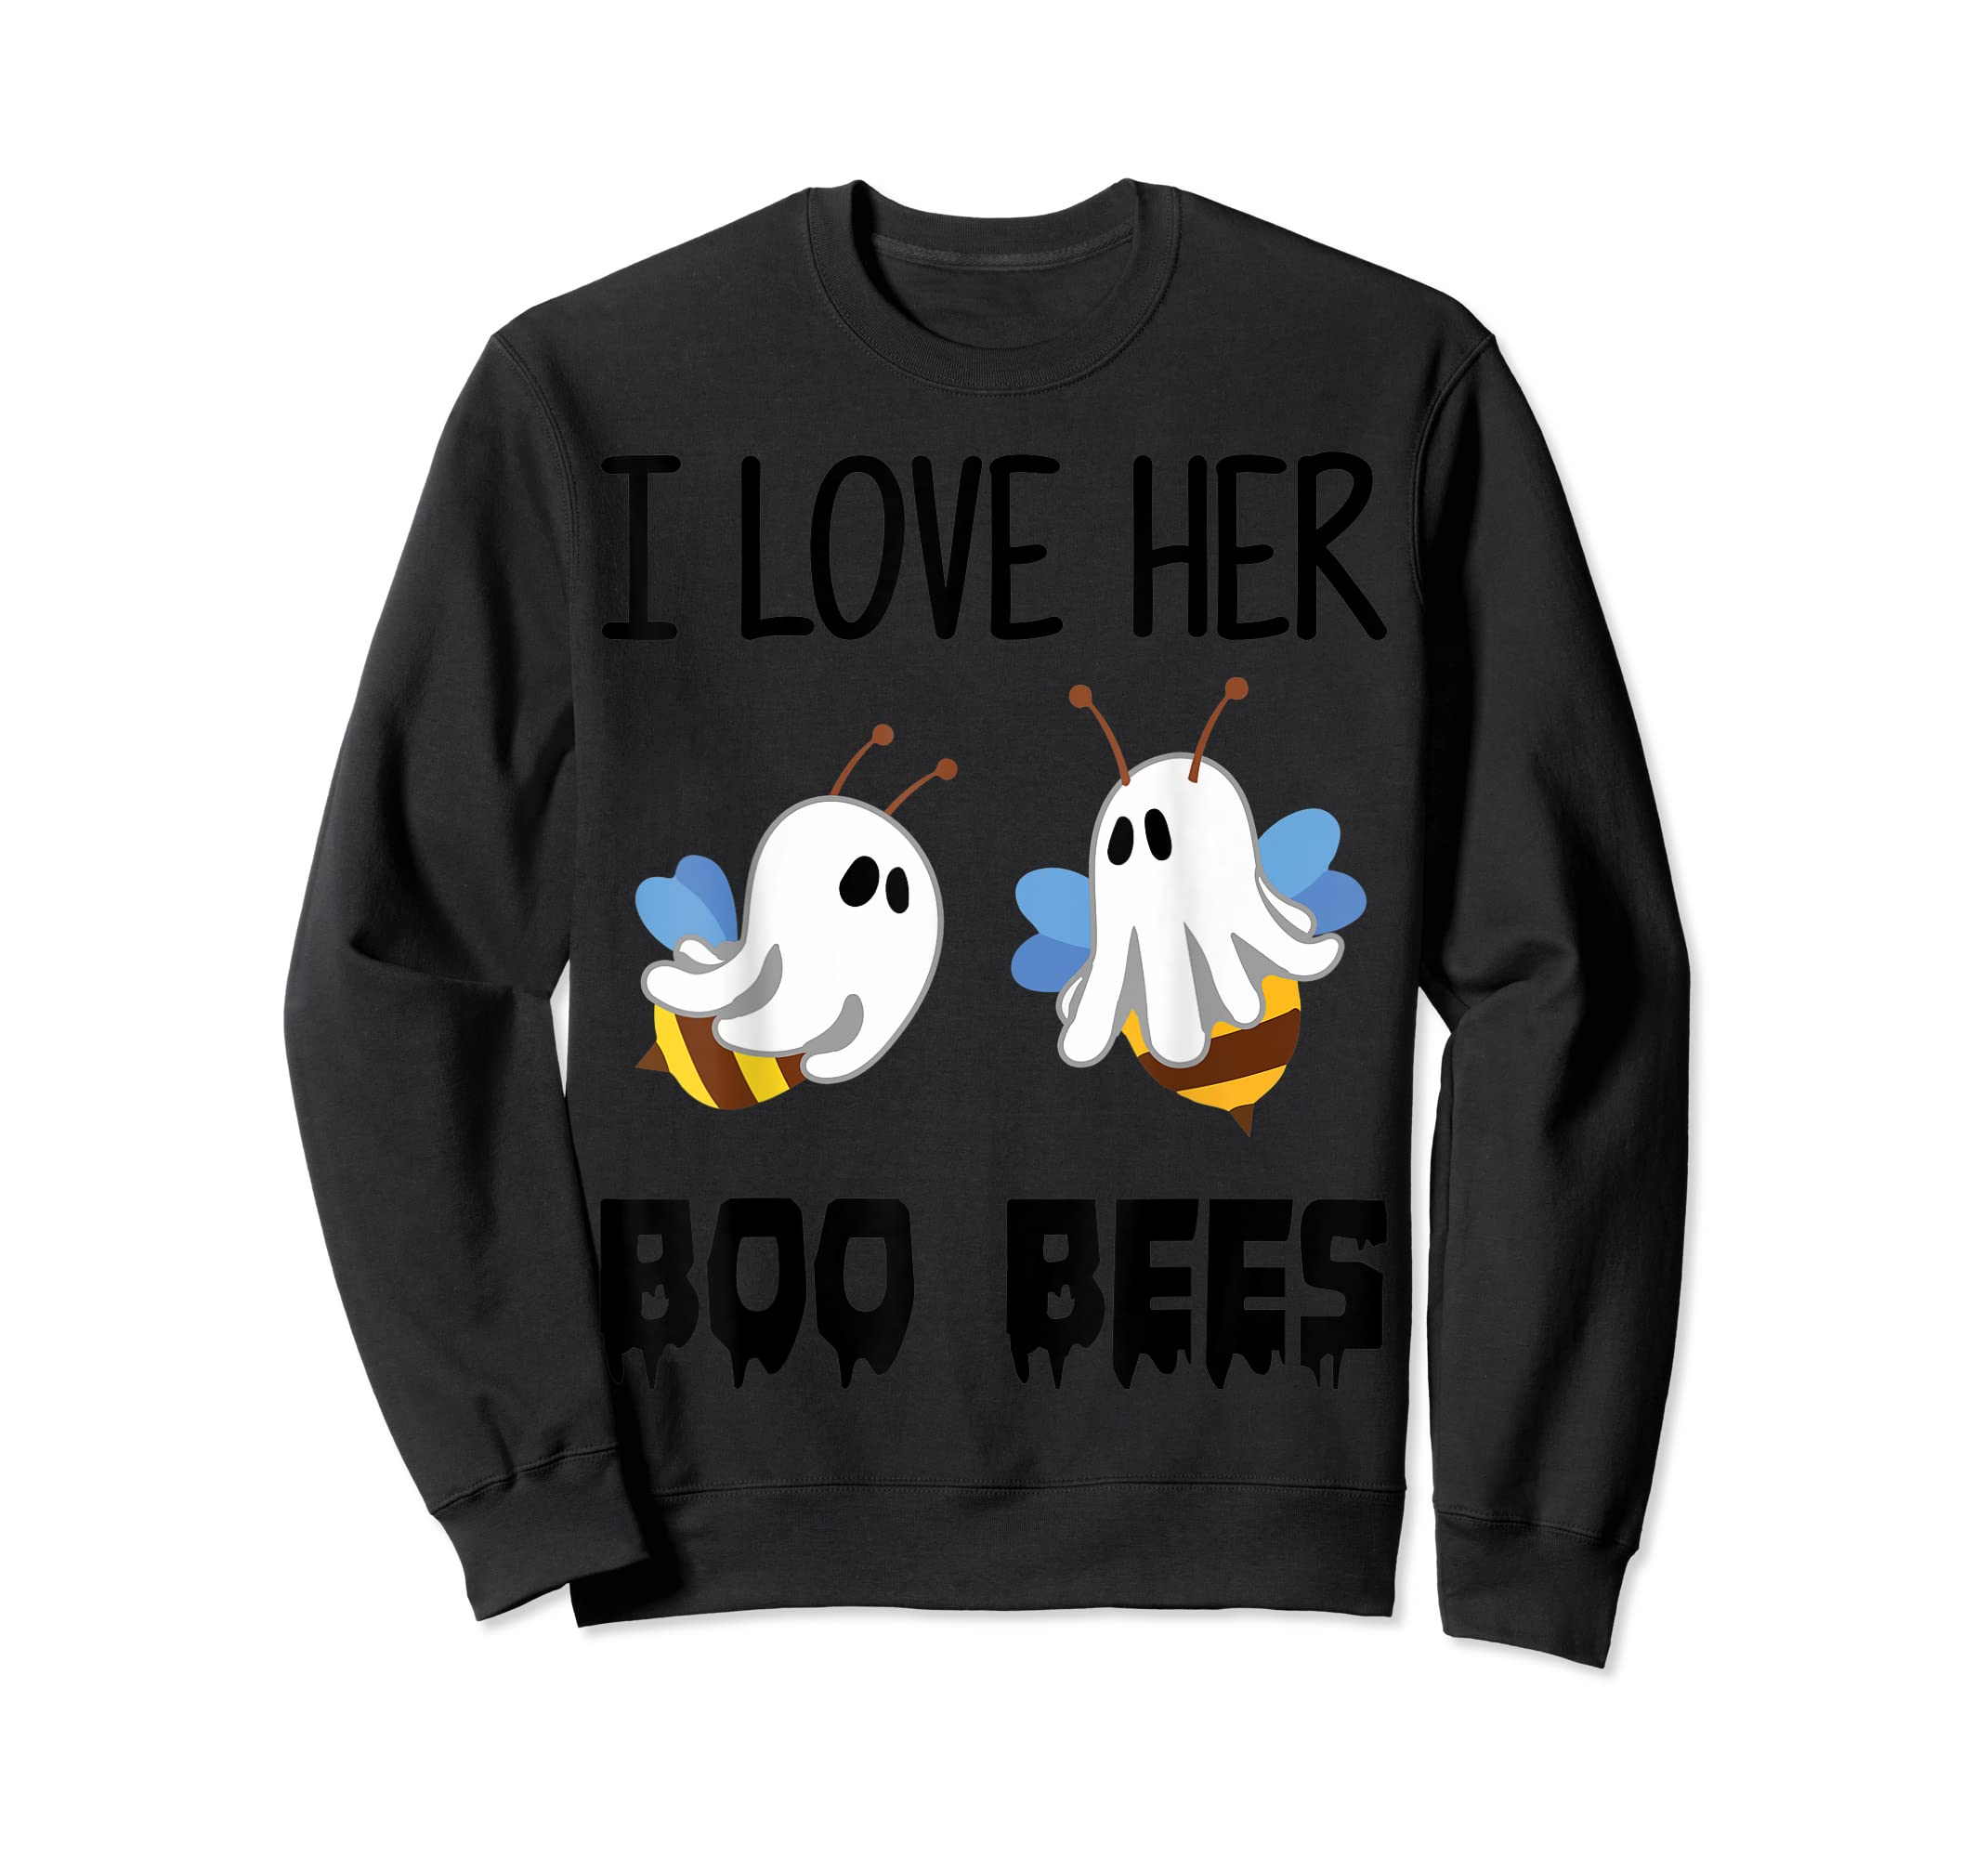 I Love Her Boo Bees Couples Funny Halloween Costume Gift T-Shirt-Sweatshirt-Black